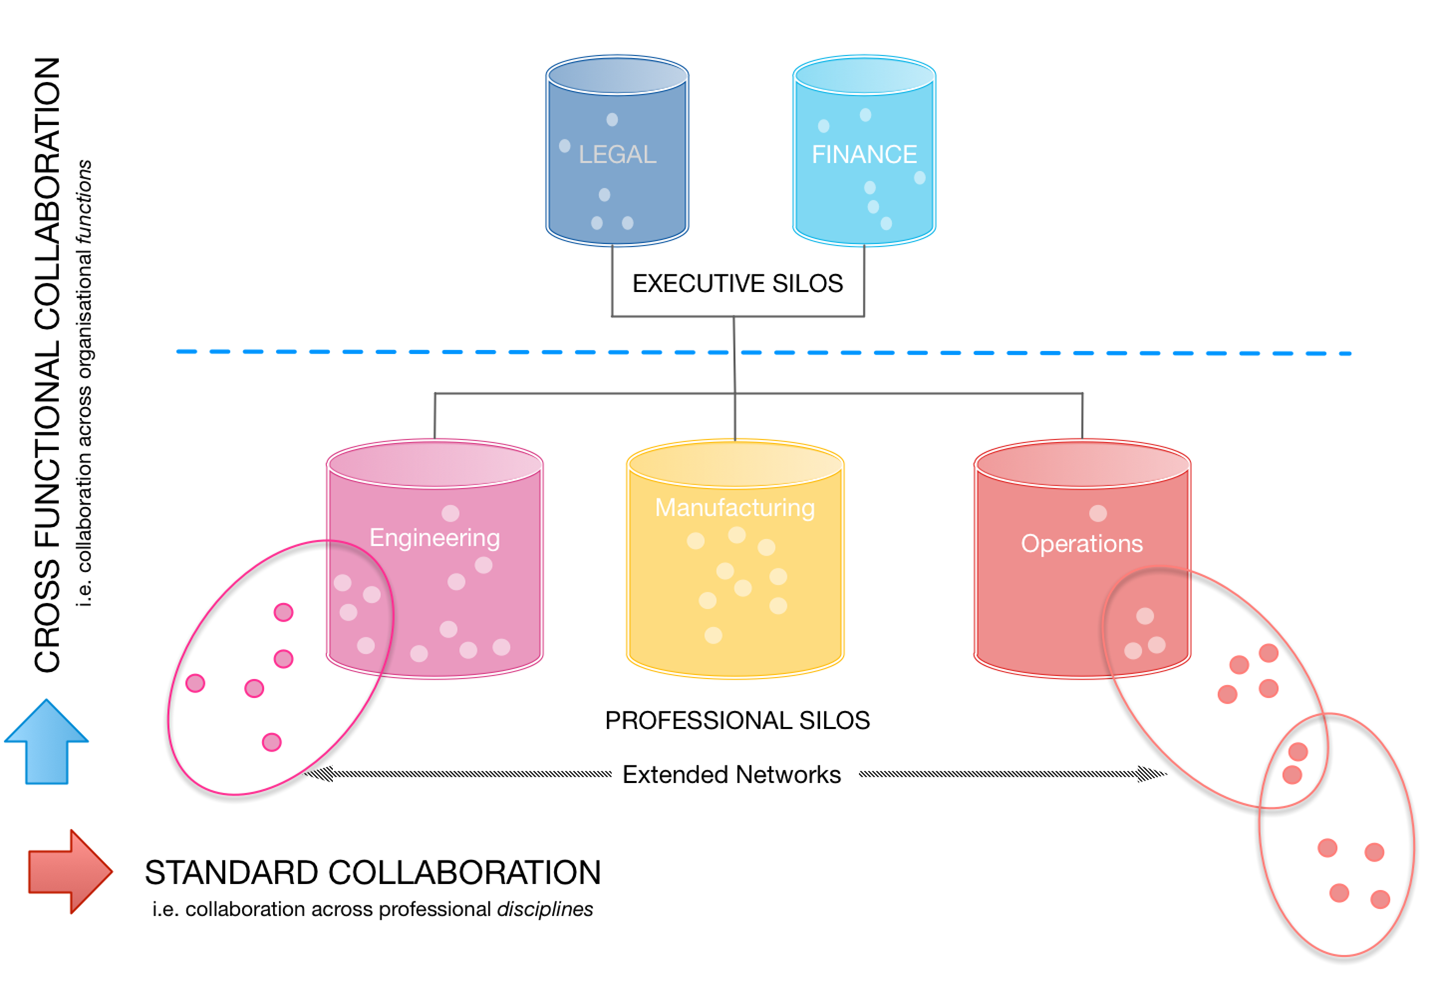 xFunctional Collaboration